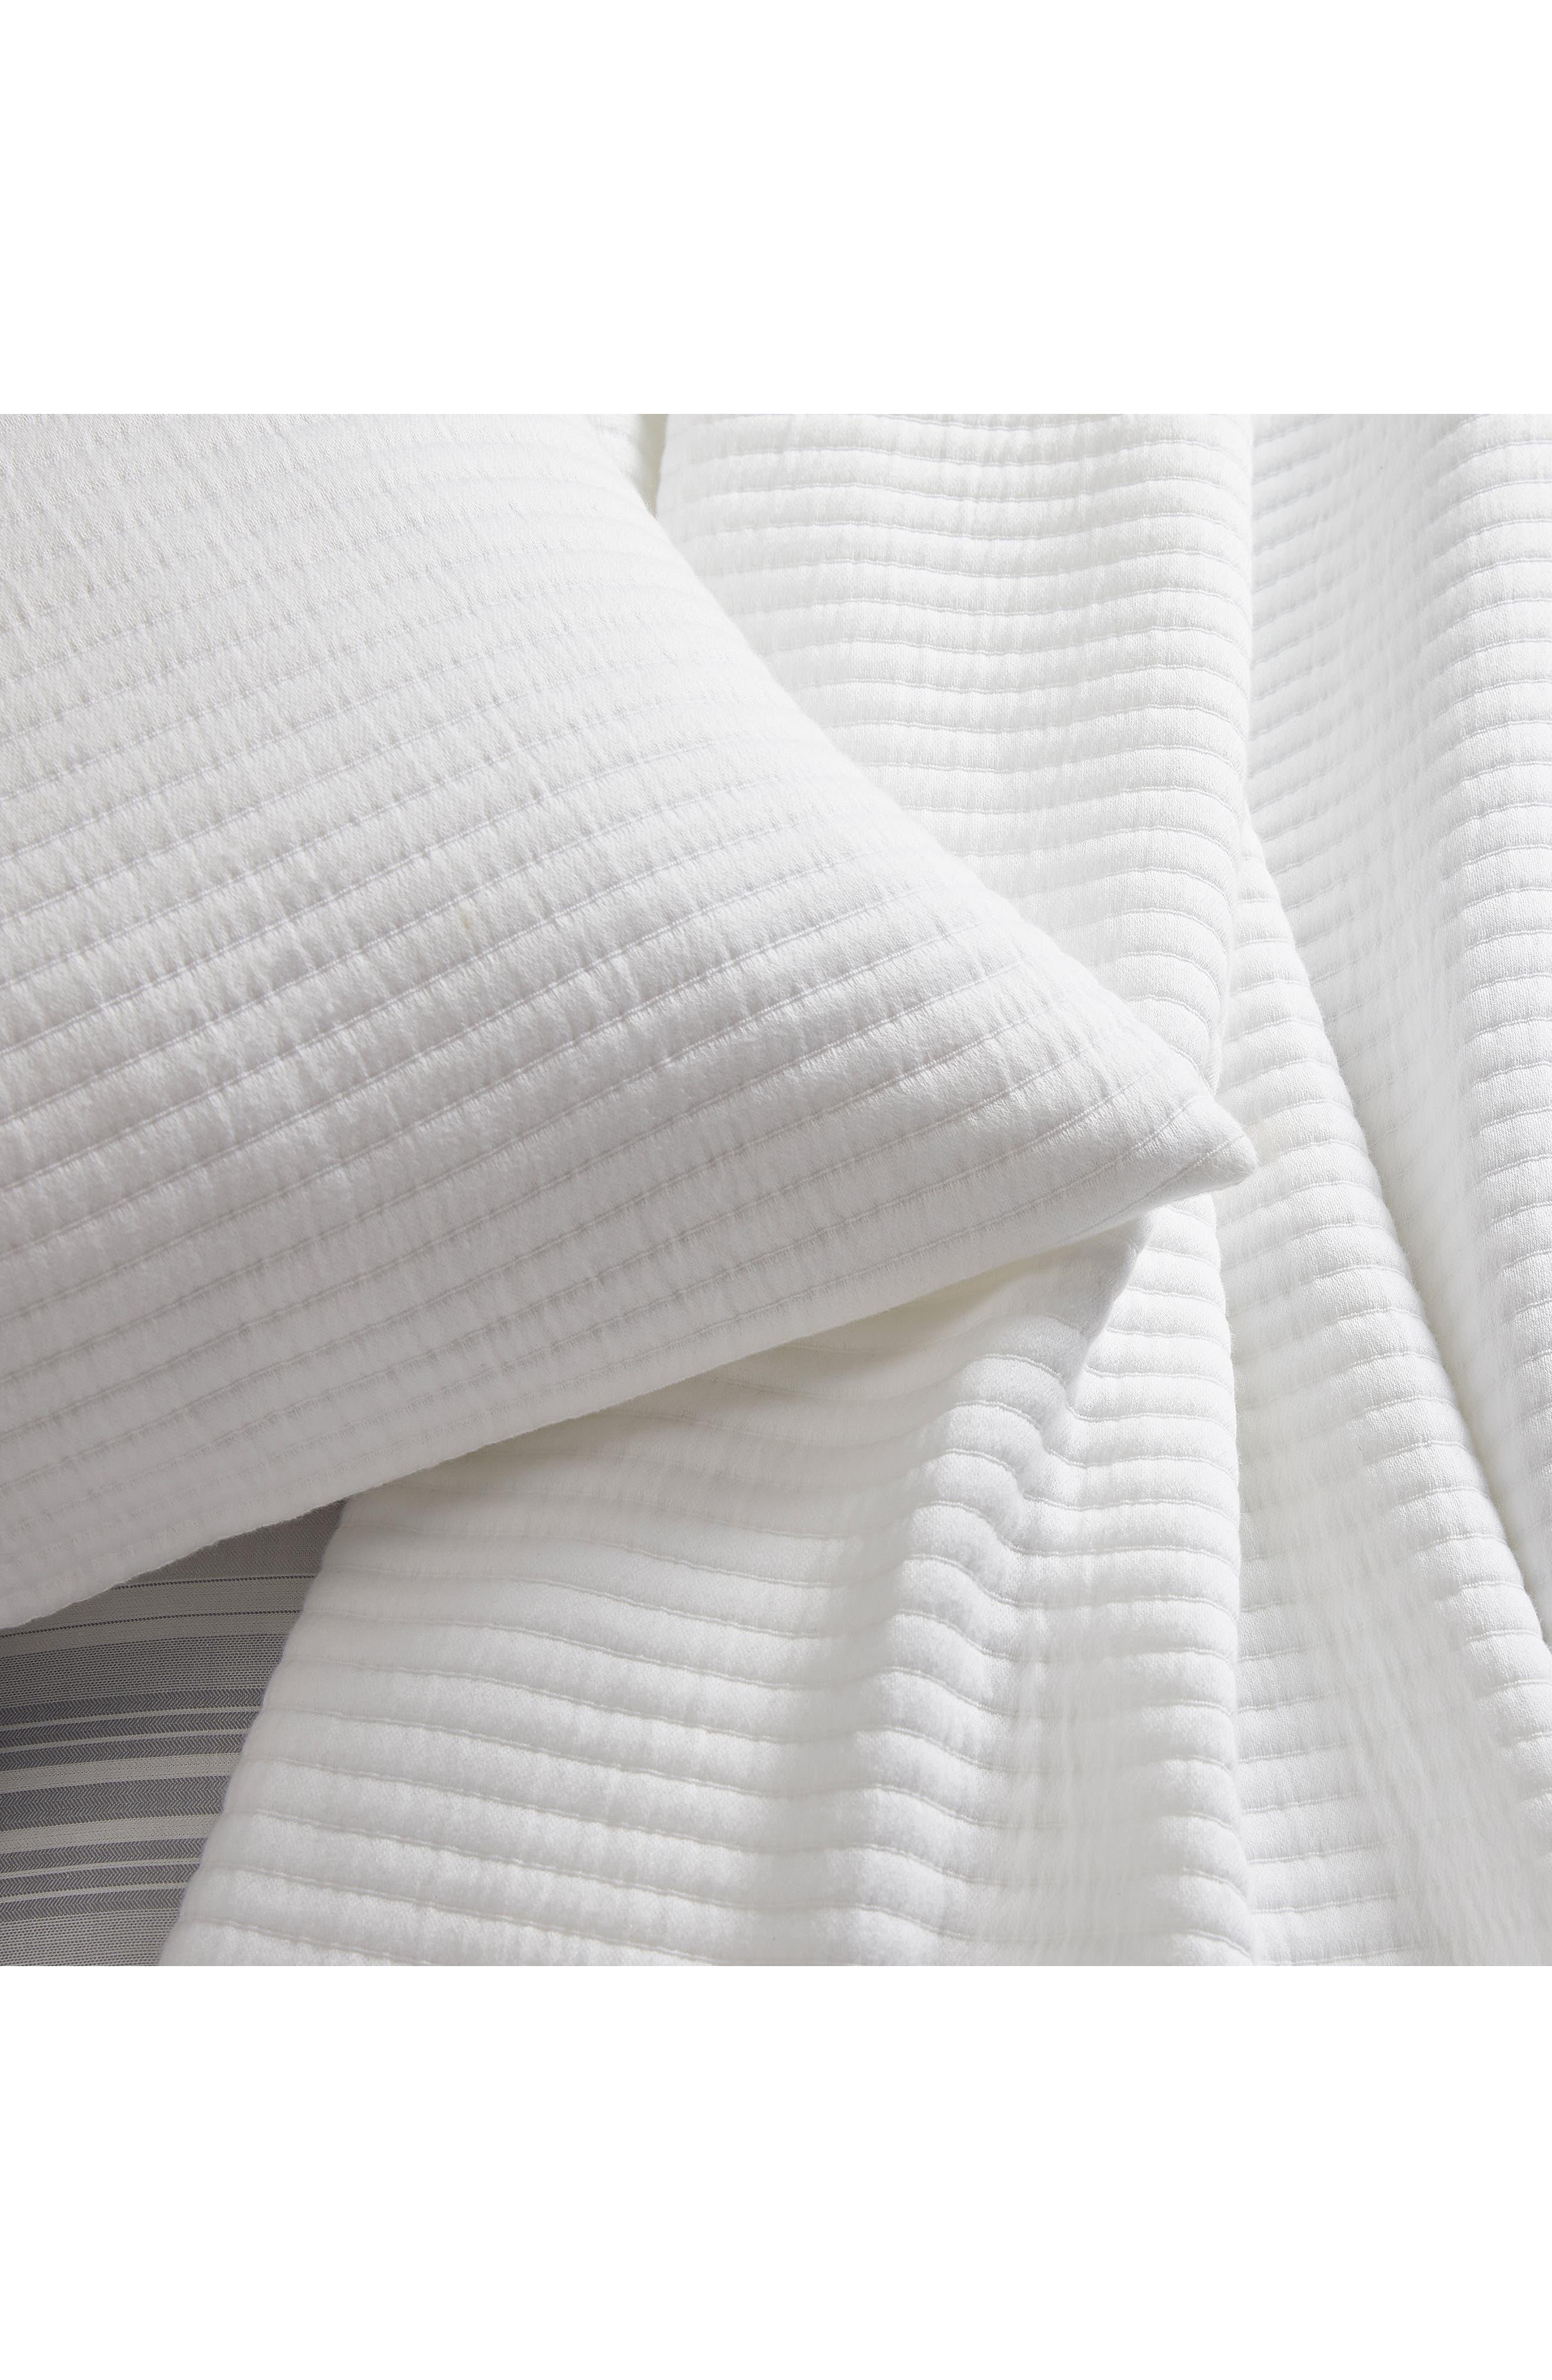 THE WHITE COMPANY,                             Classic Rib Cushion Cover,                             Alternate thumbnail 2, color,                             WHITE